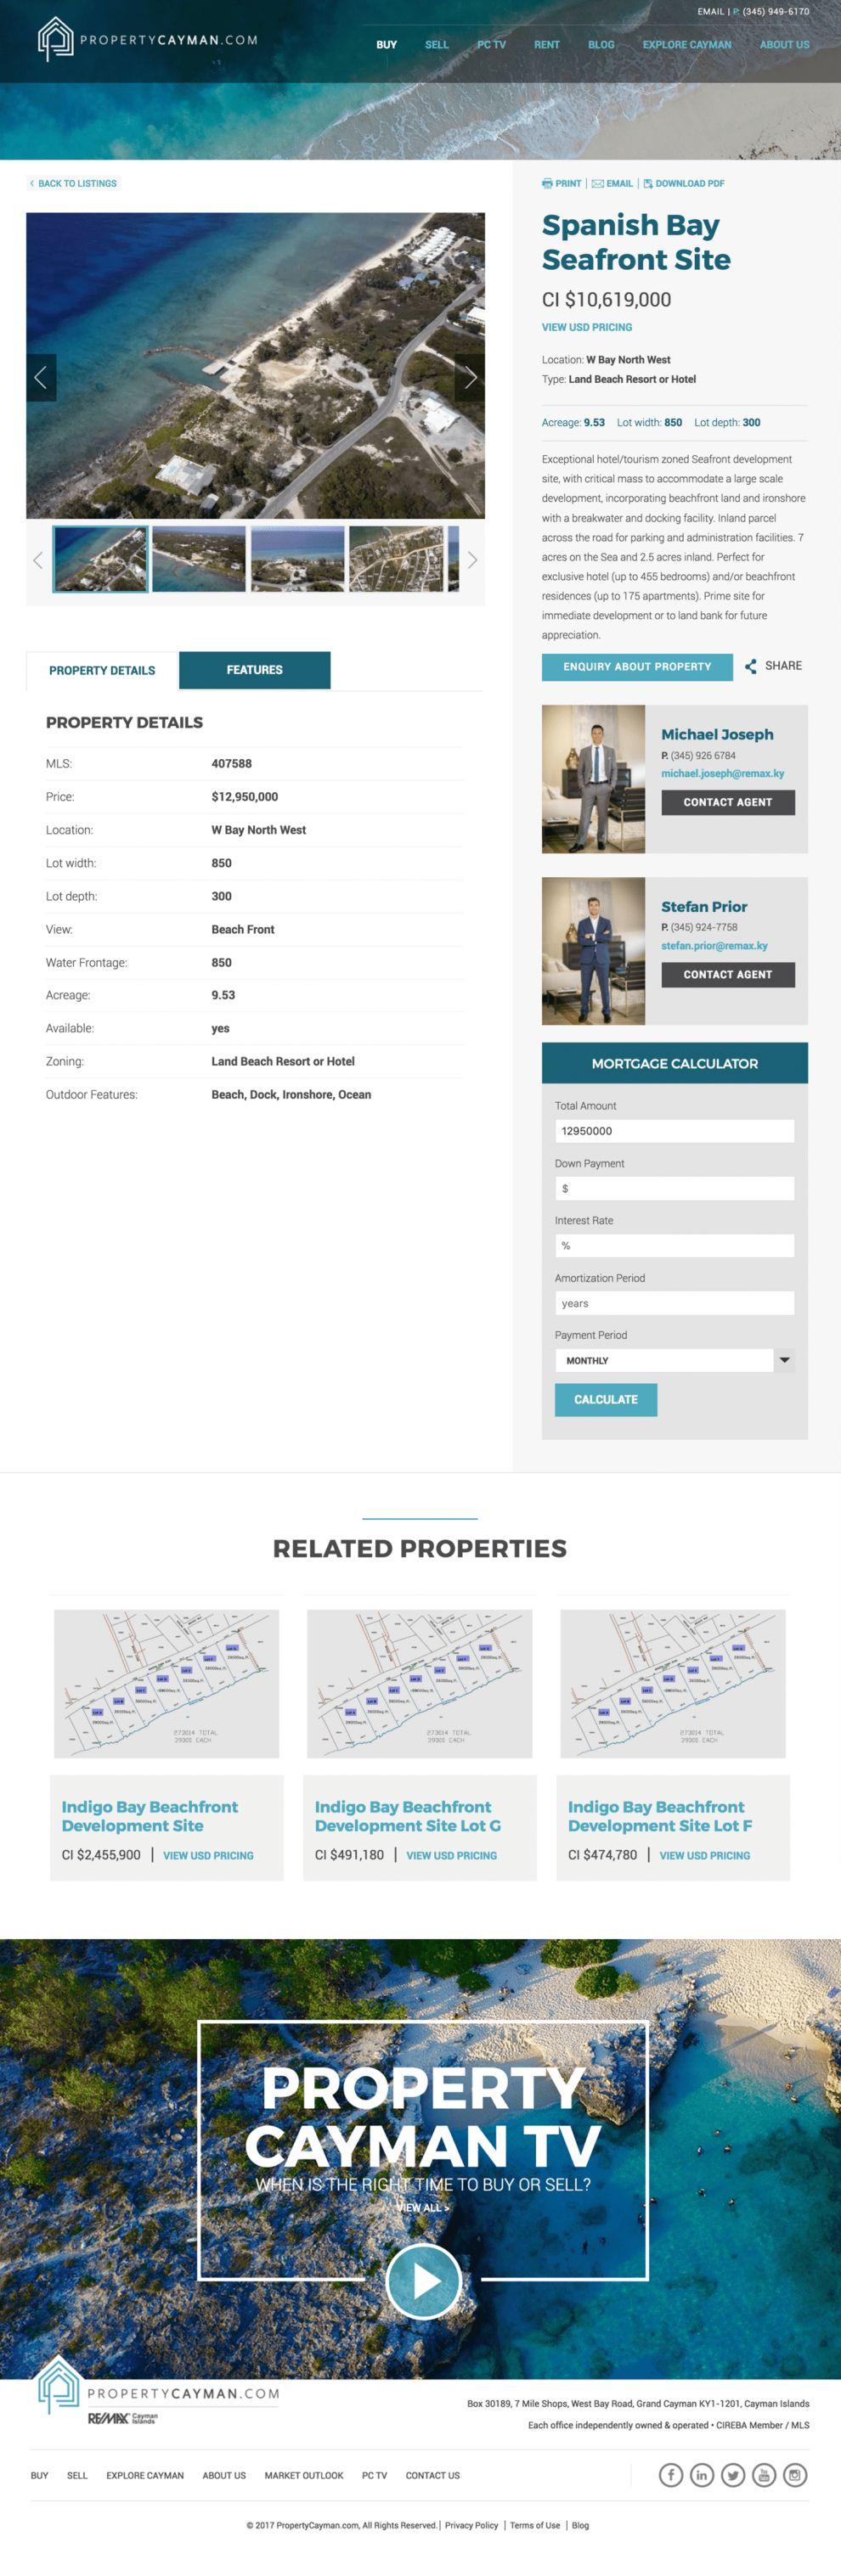 Property Cayman Beautiful Product Page